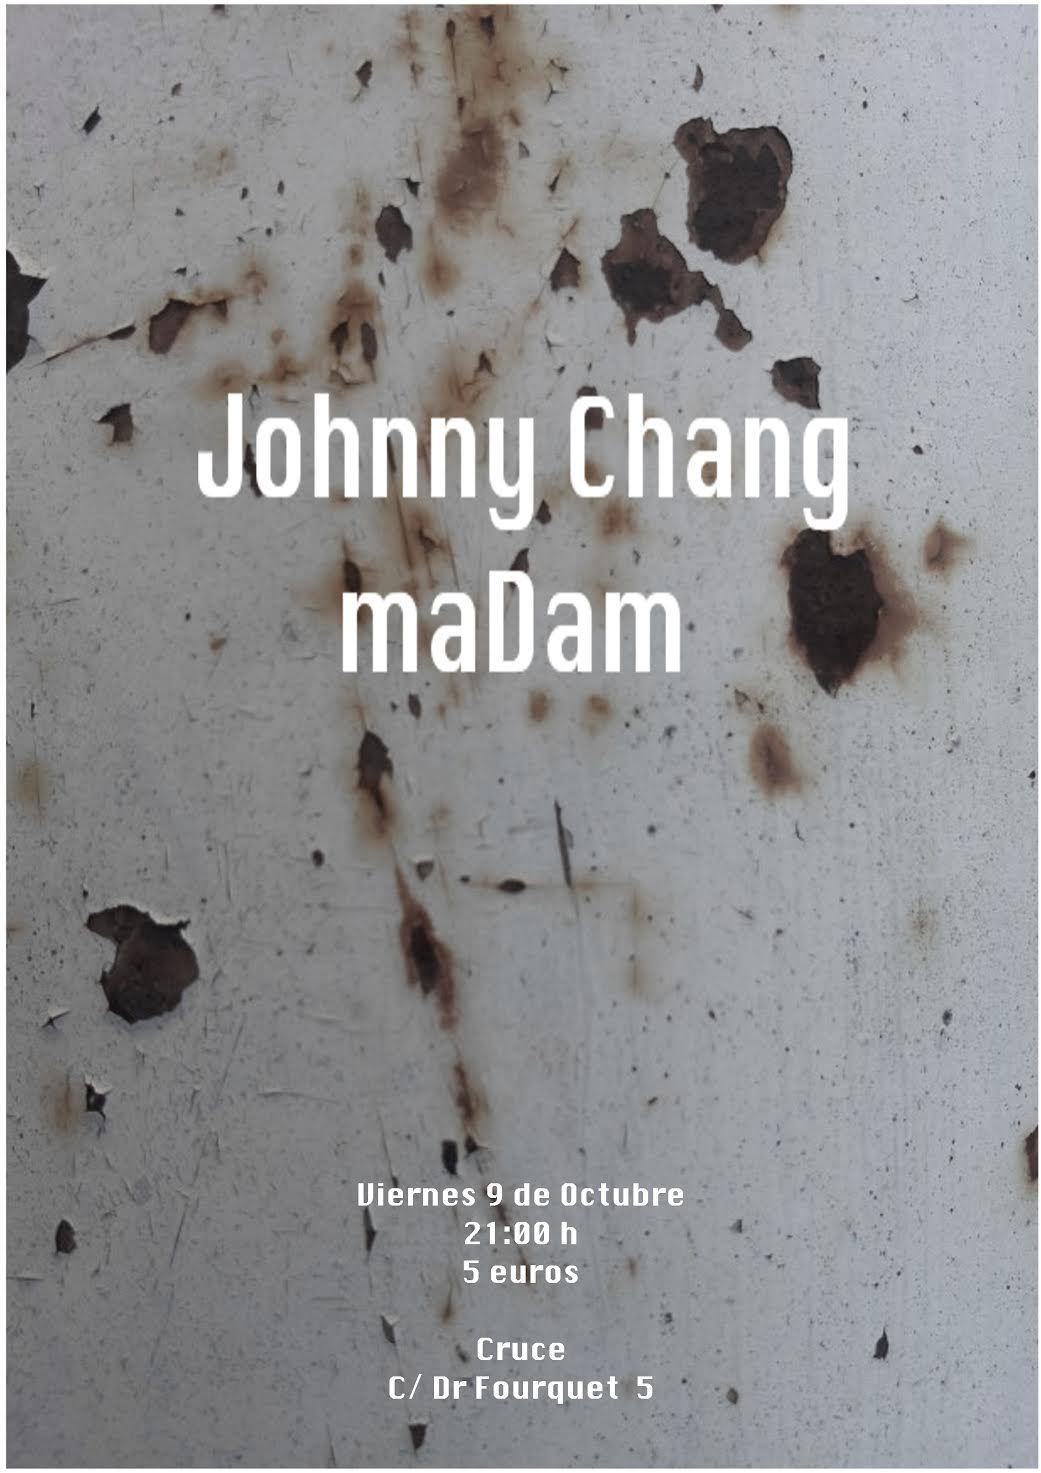 Johnny Chang - Madam